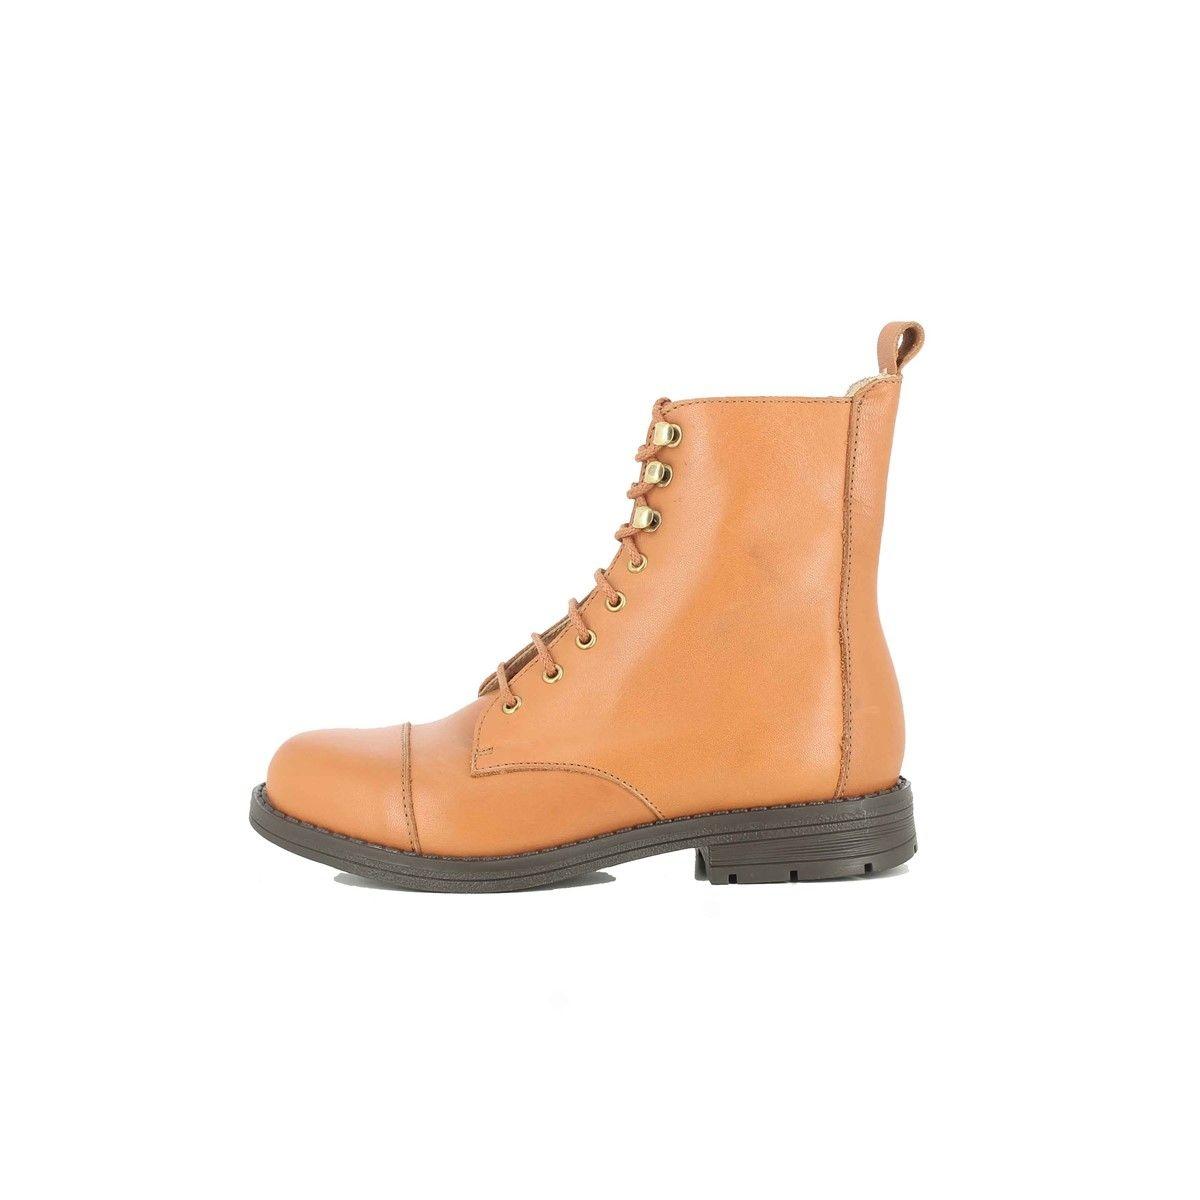 Boots hautes Rangers cuir